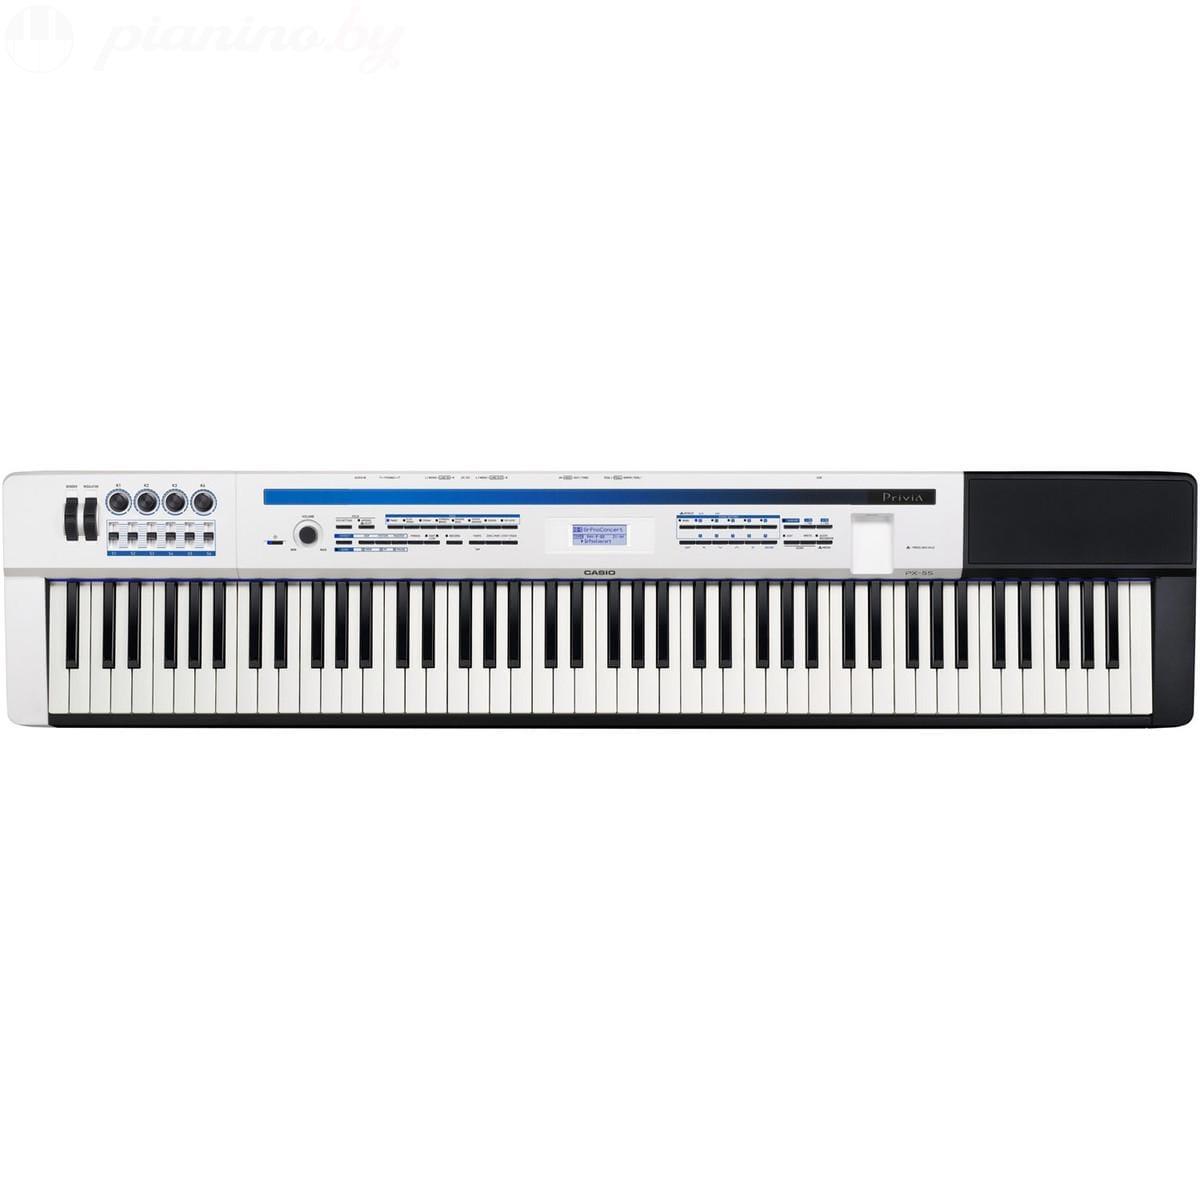 Сценическое пианино Casio PX-5SWE Фото 2